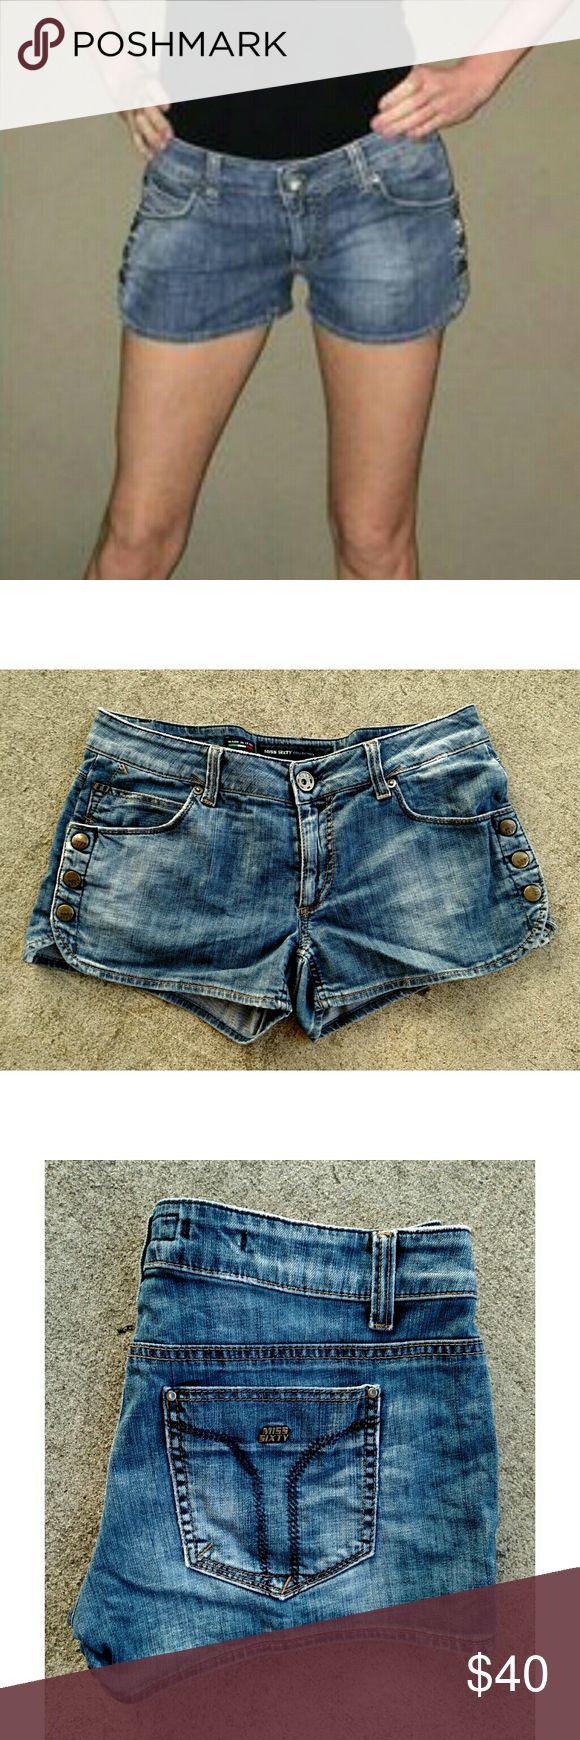 Miss Sixty jean shorts. Size 32 Super cute Miss Sixty disttessed shorts. Size 32 Miss Sixty Shorts Jean Shorts